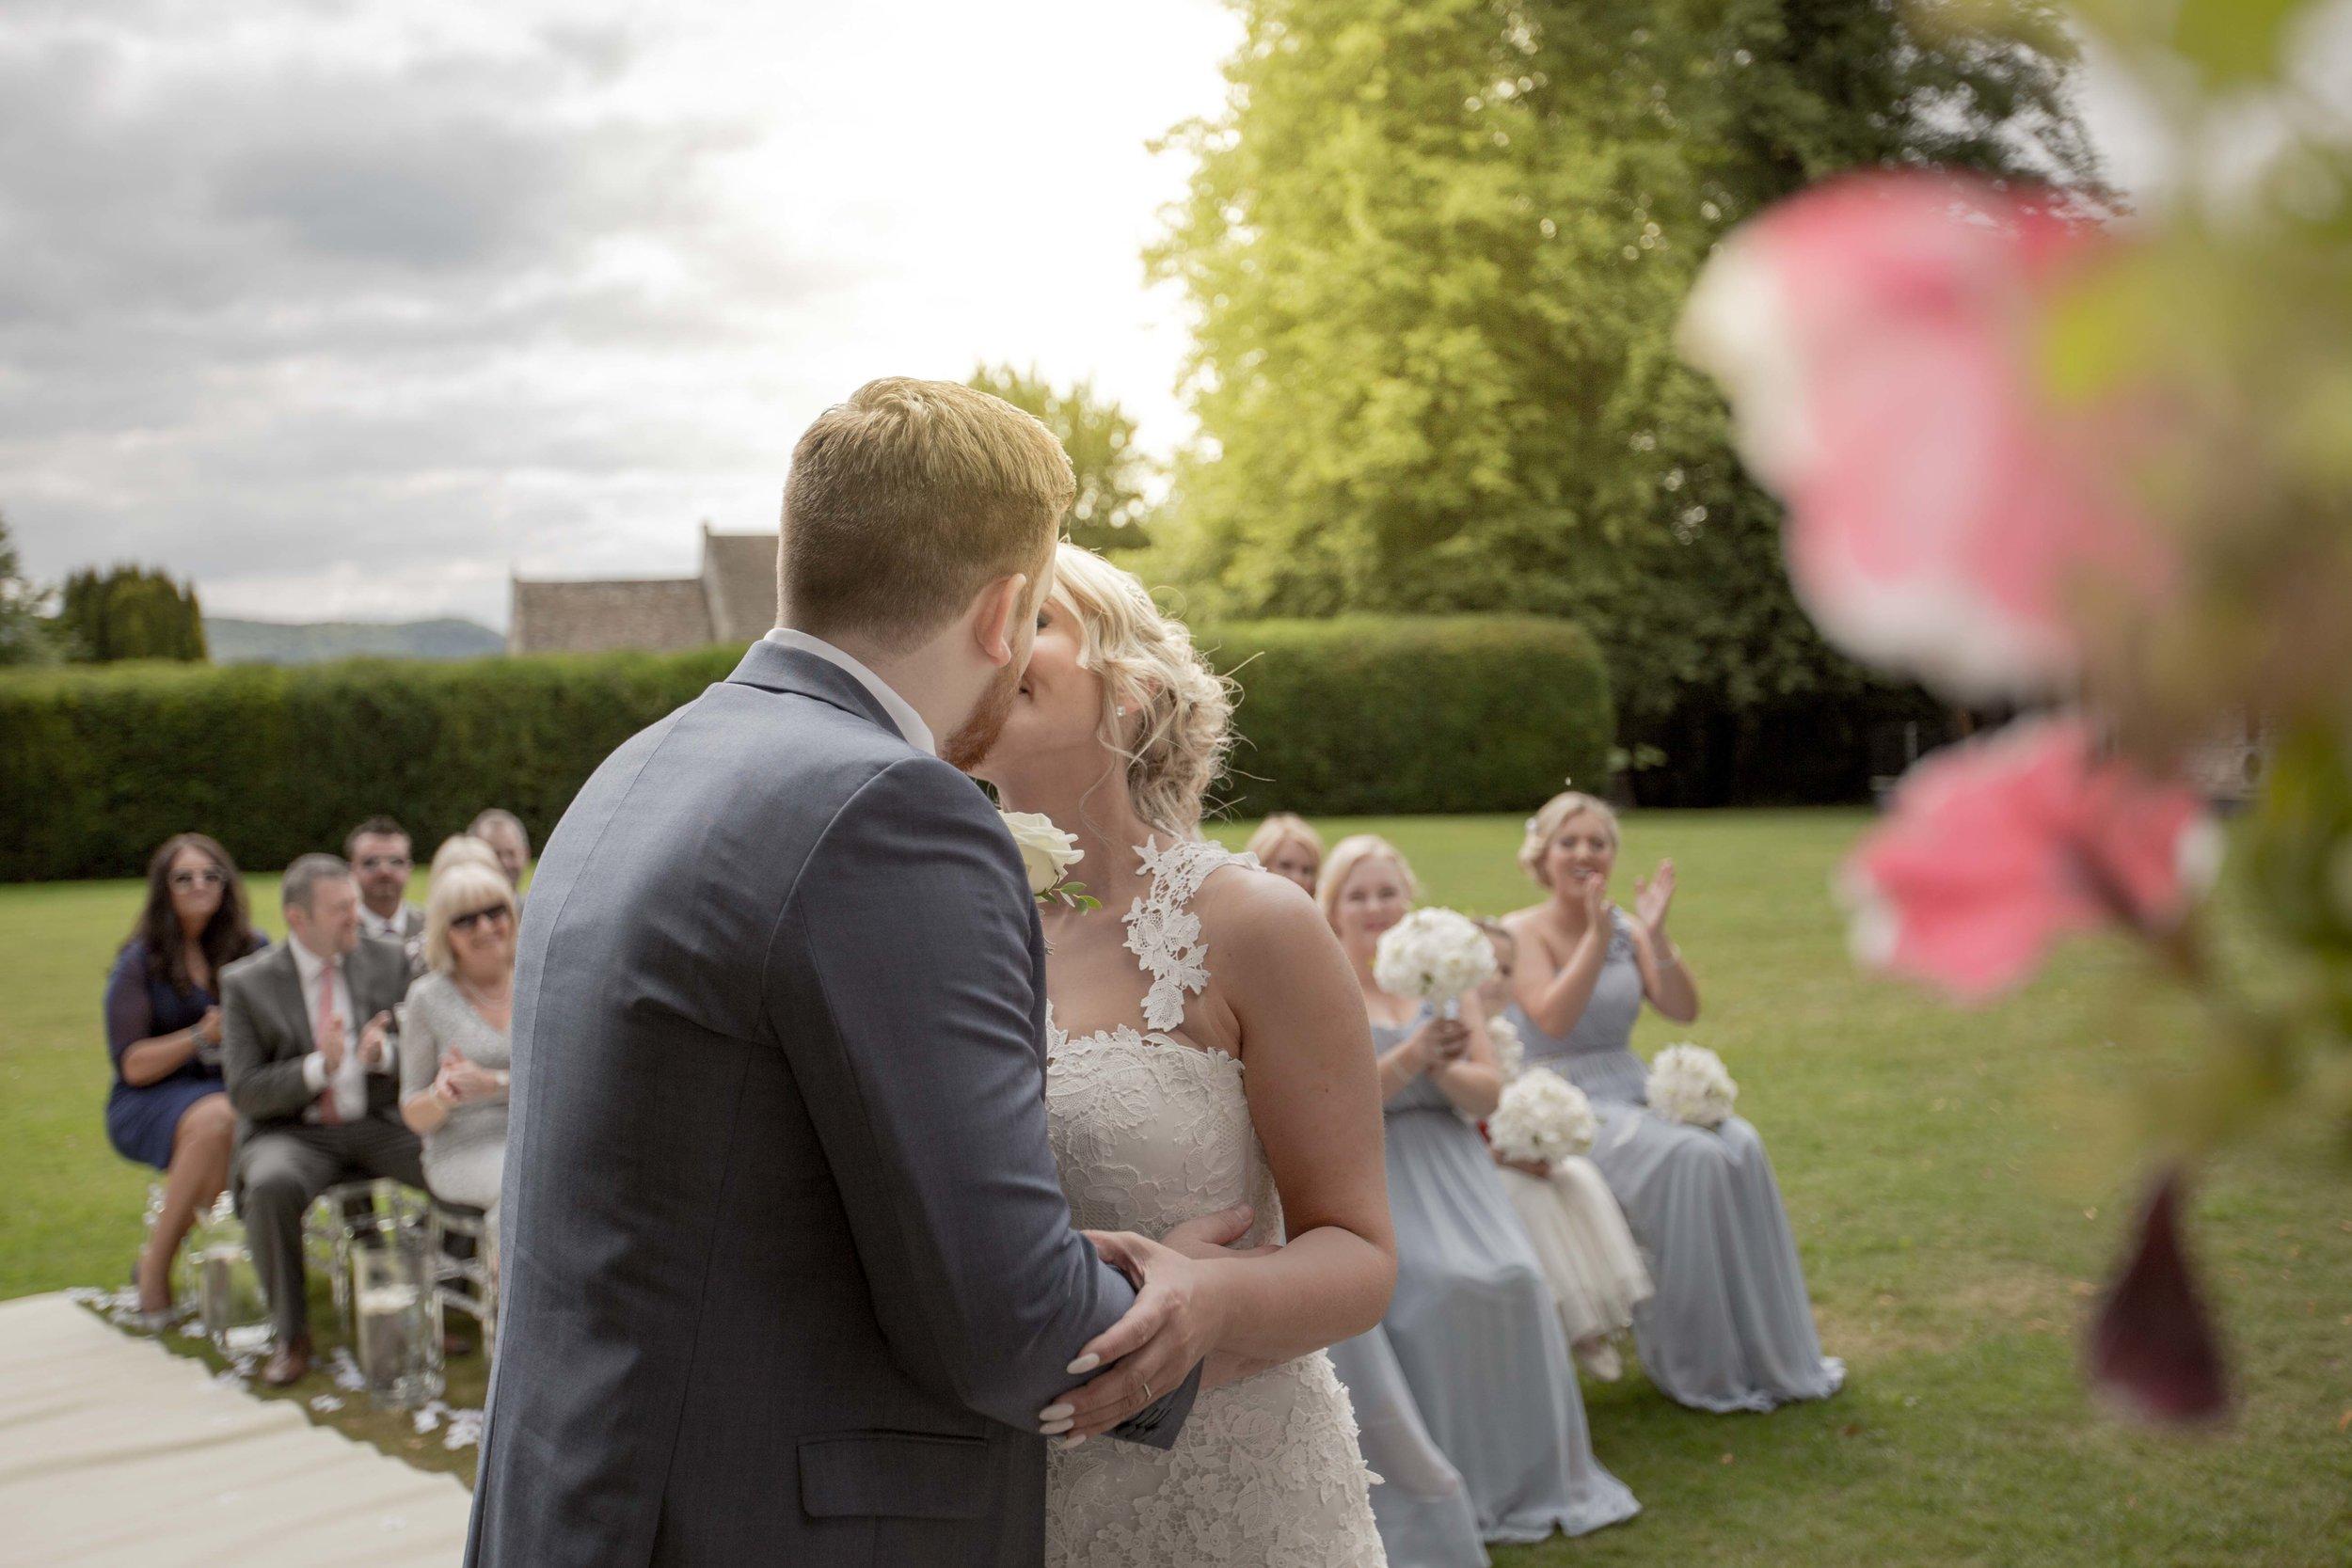 cotswold-wedding-photography-at-stonehouse-court-hotel-natalia-smith-photography-gloucestershire-wedding-photographer-42.jpg